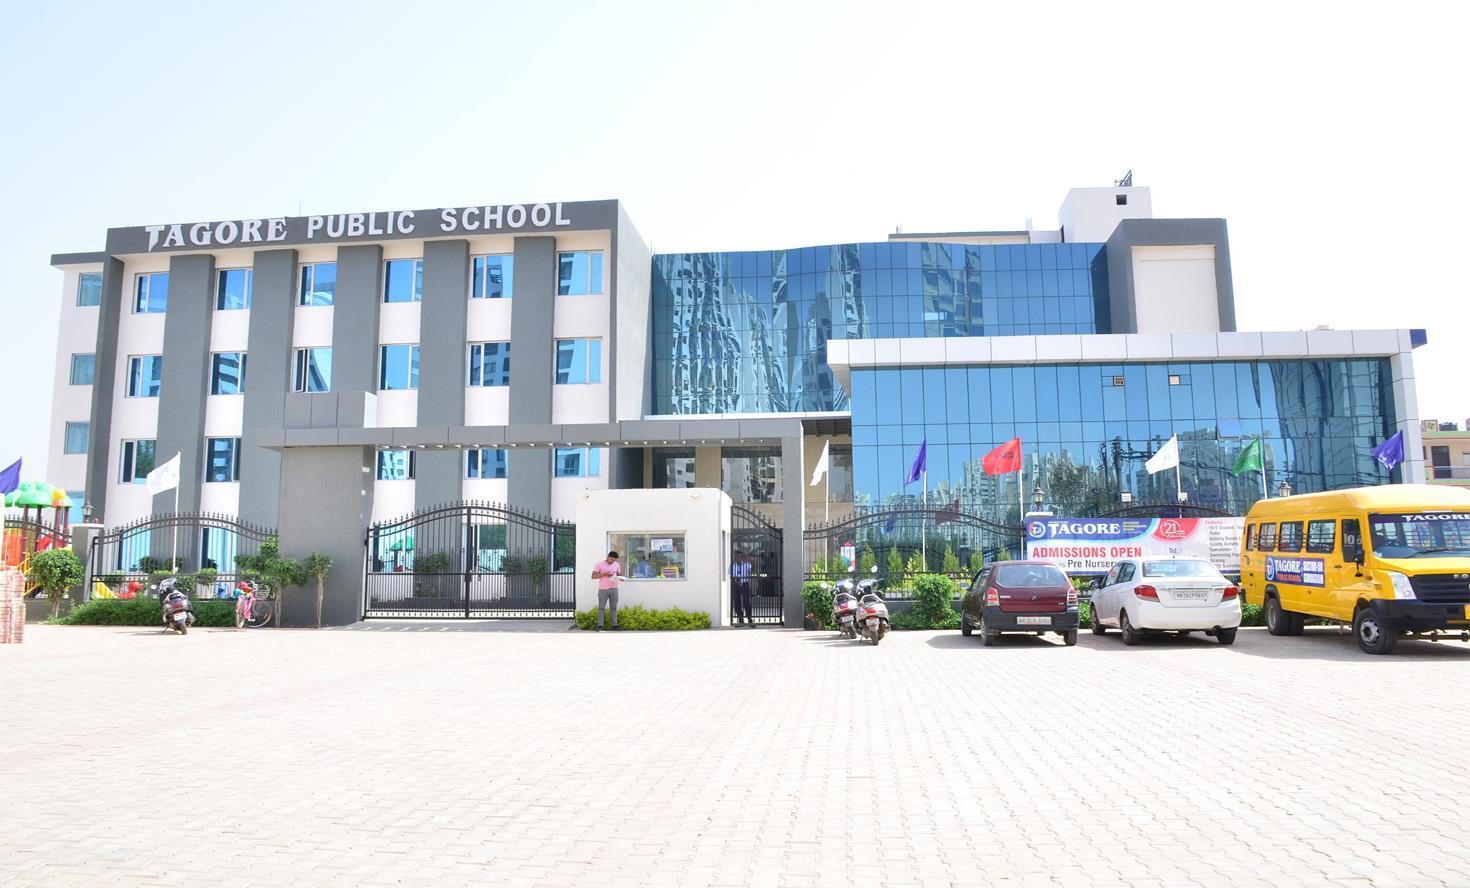 Tagore Public School Gurugram